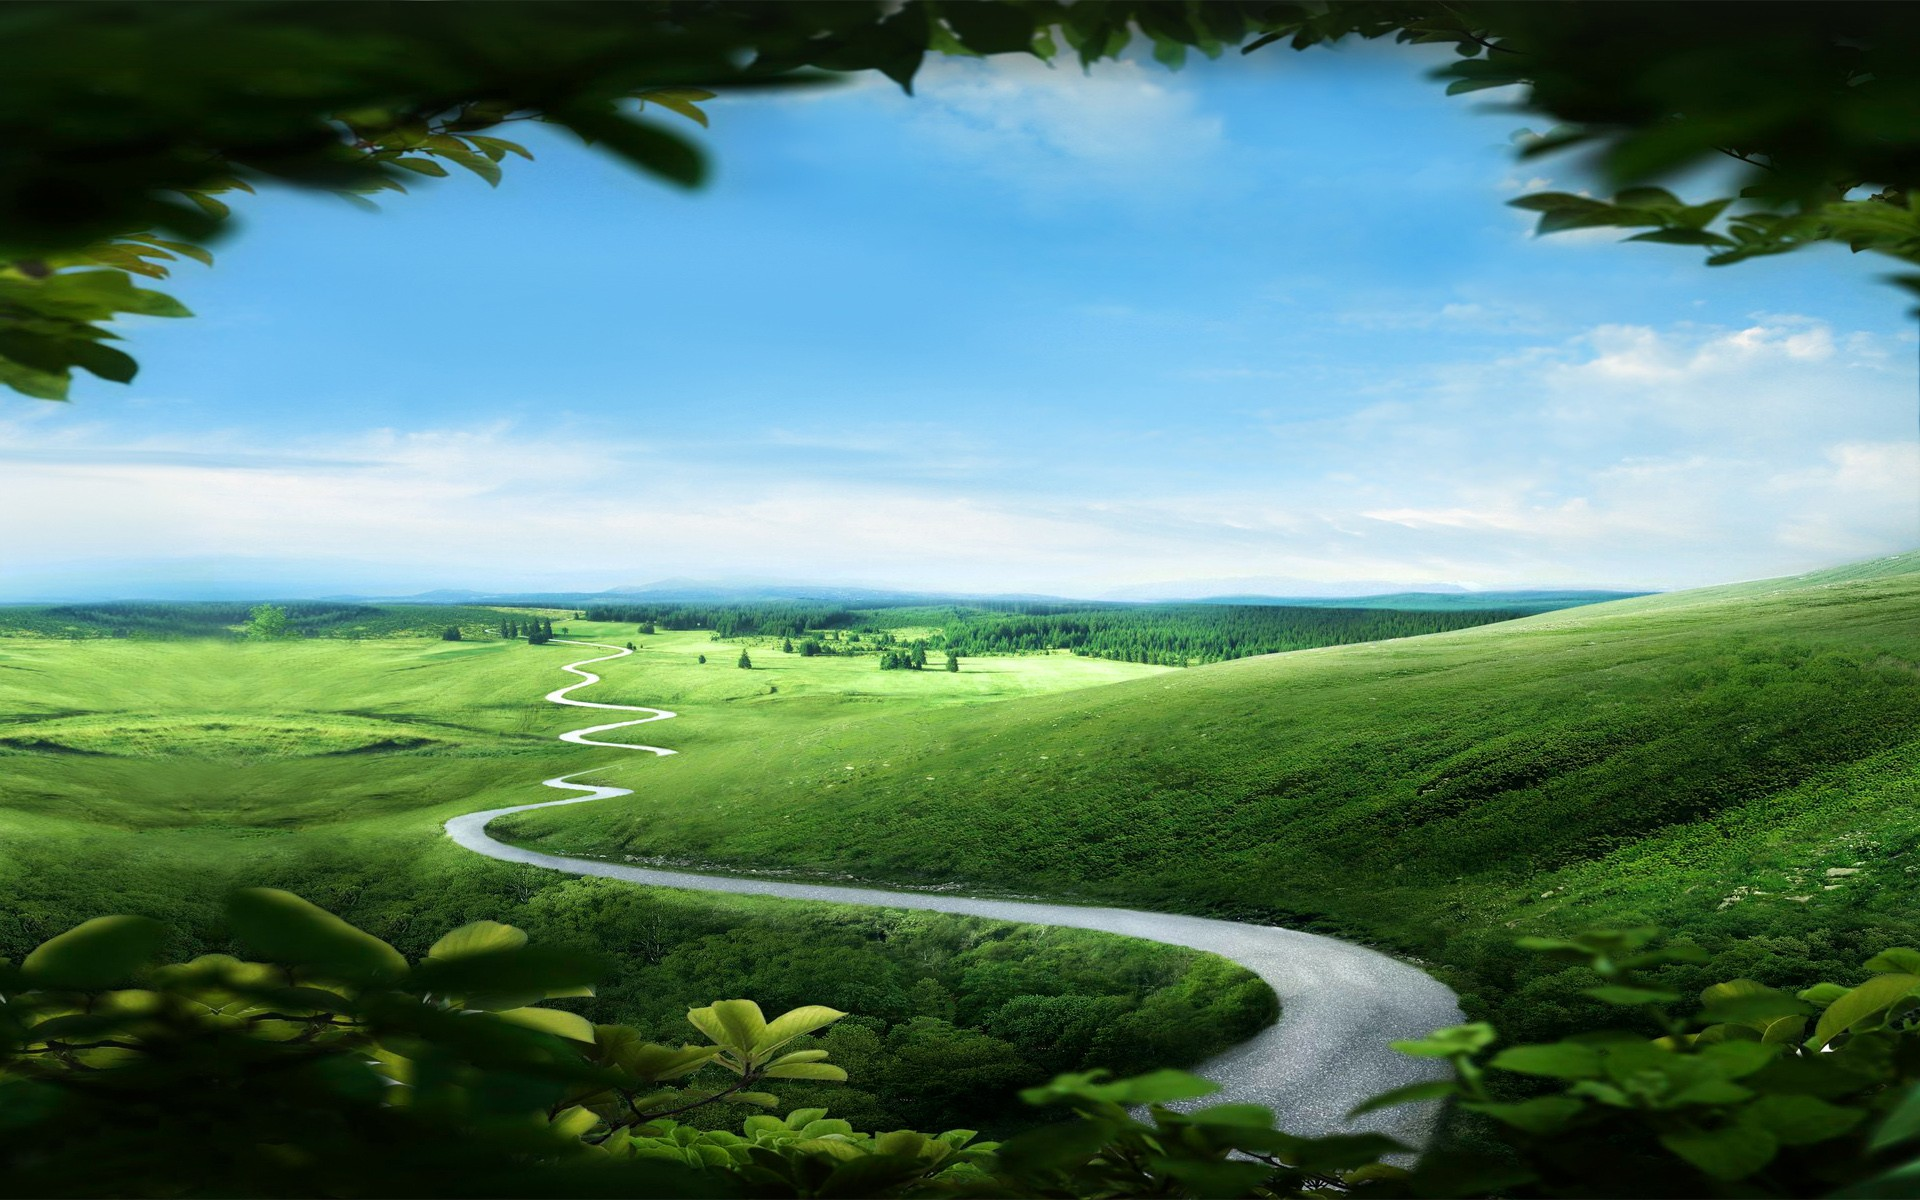 Cute Fairy Wallpaper 3d Landscape Path Hd Nature 4k Wallpapers Images